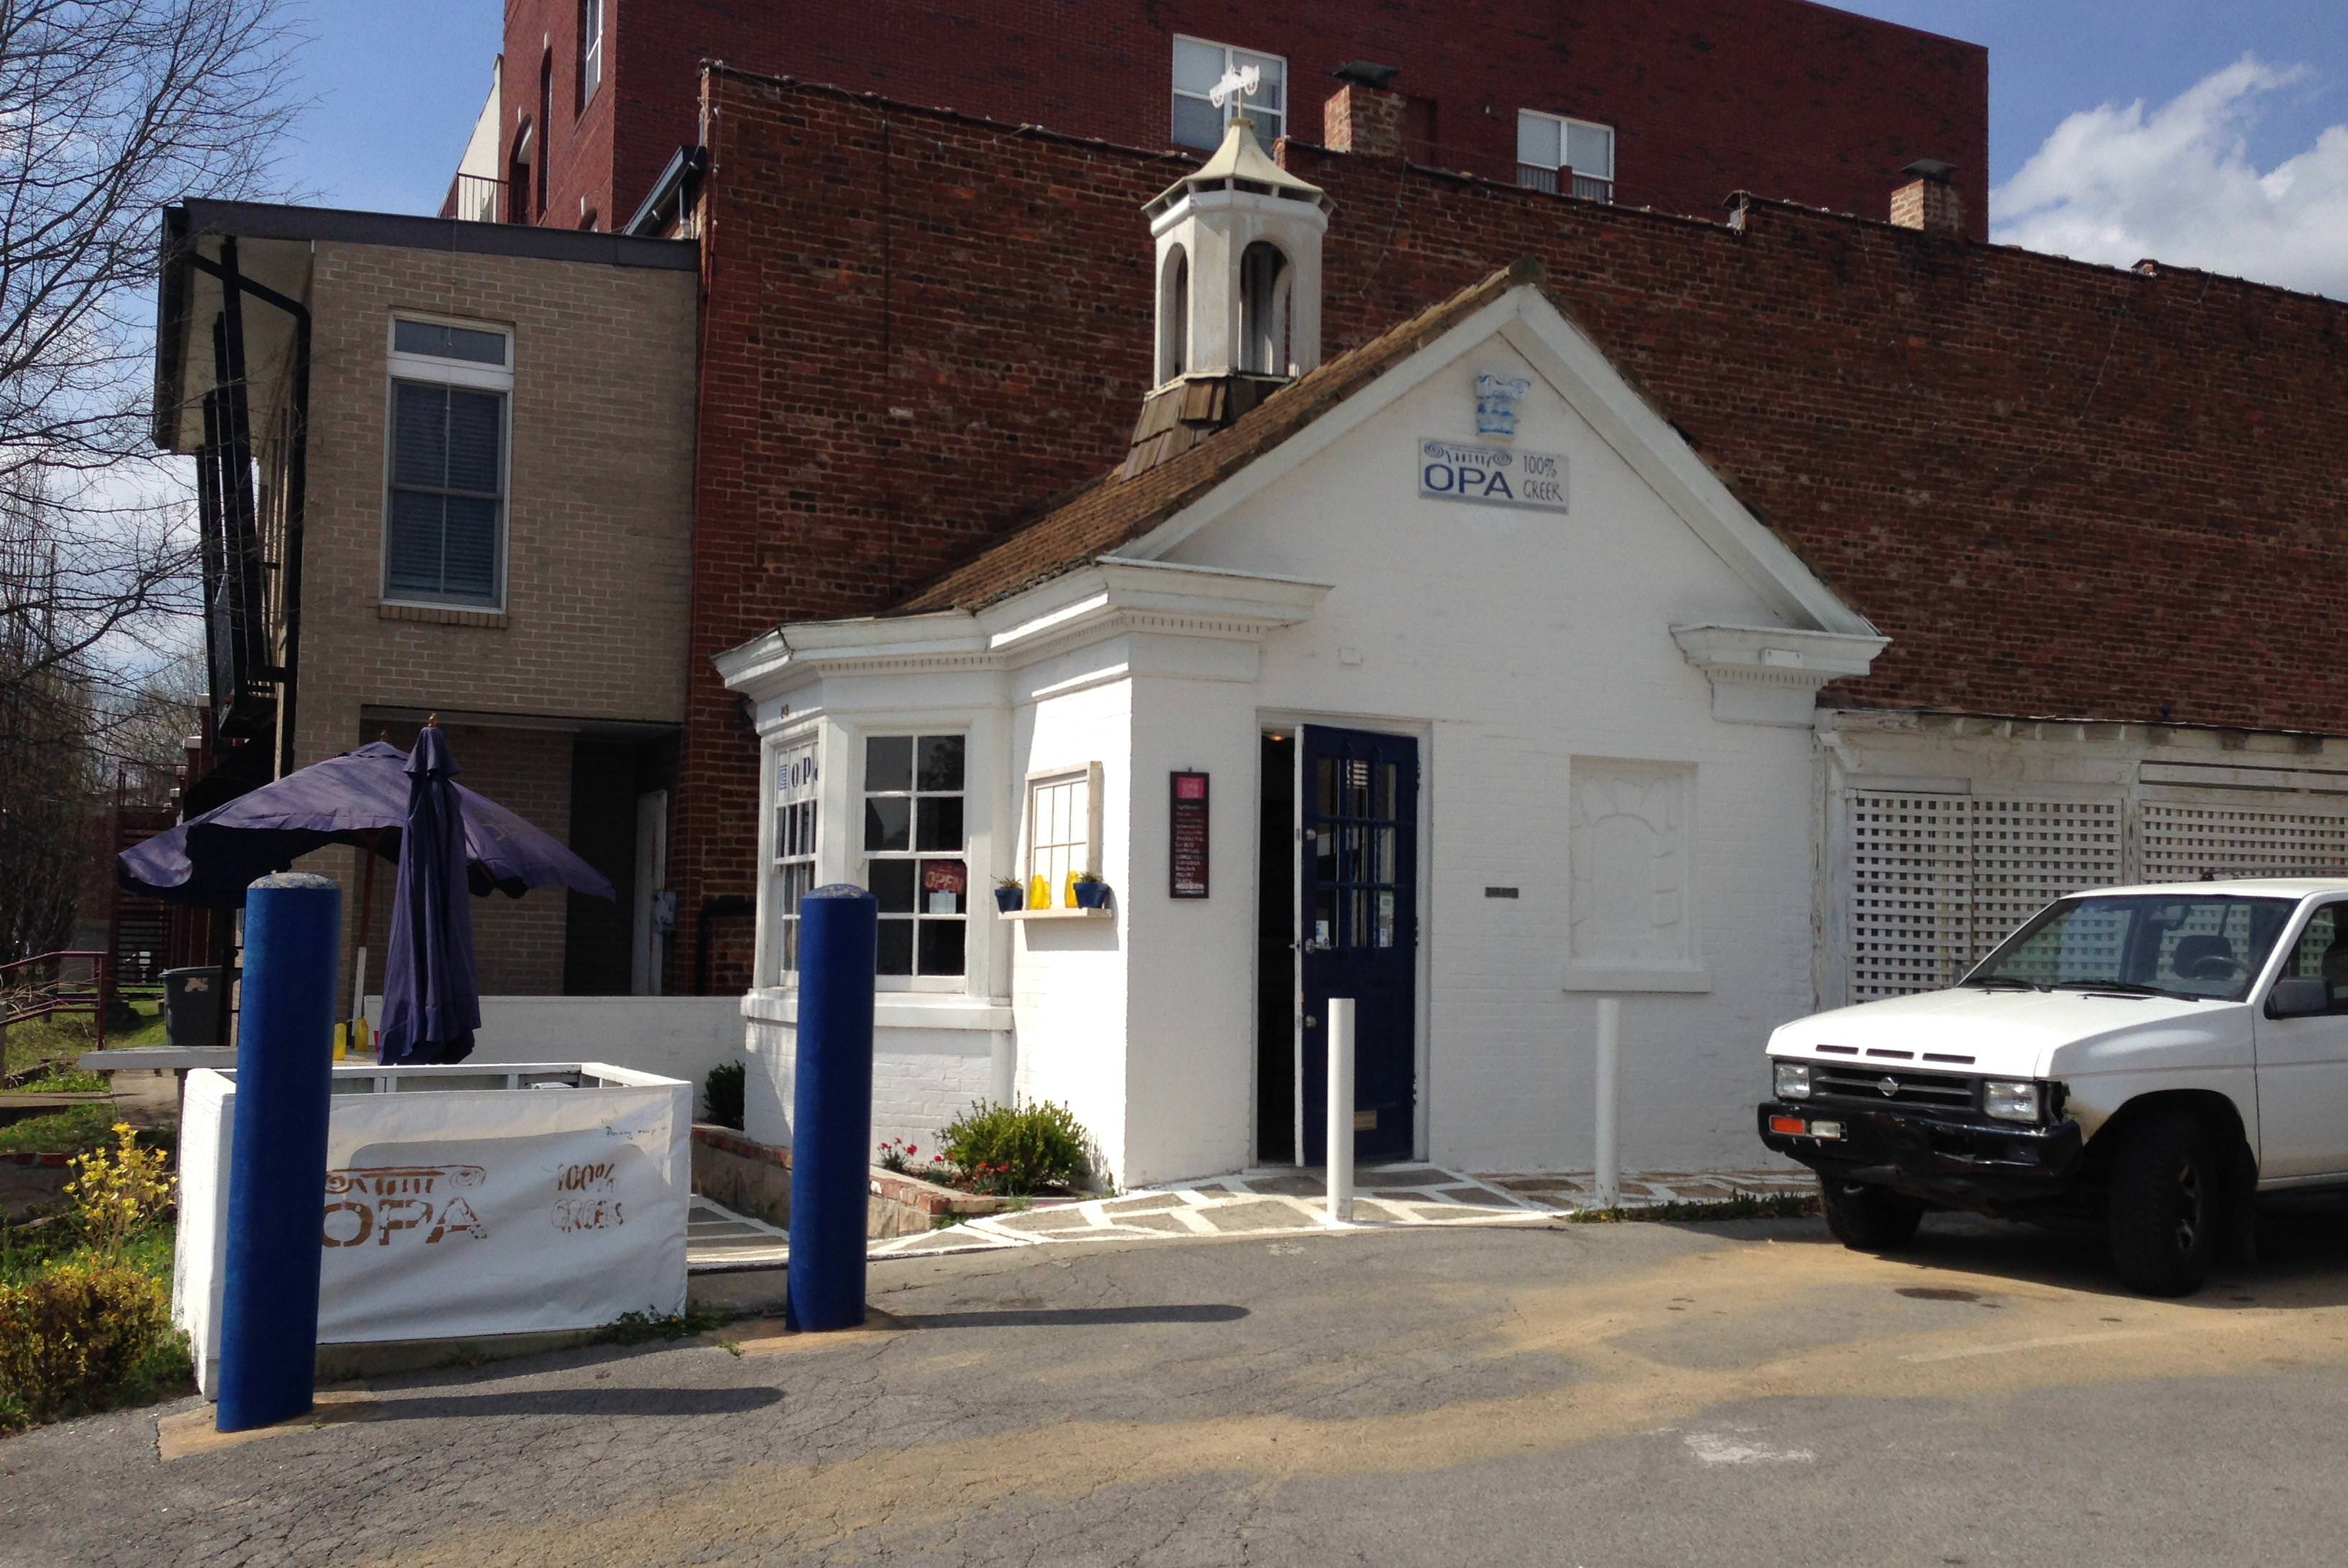 New Restaurants In North Chattanooga